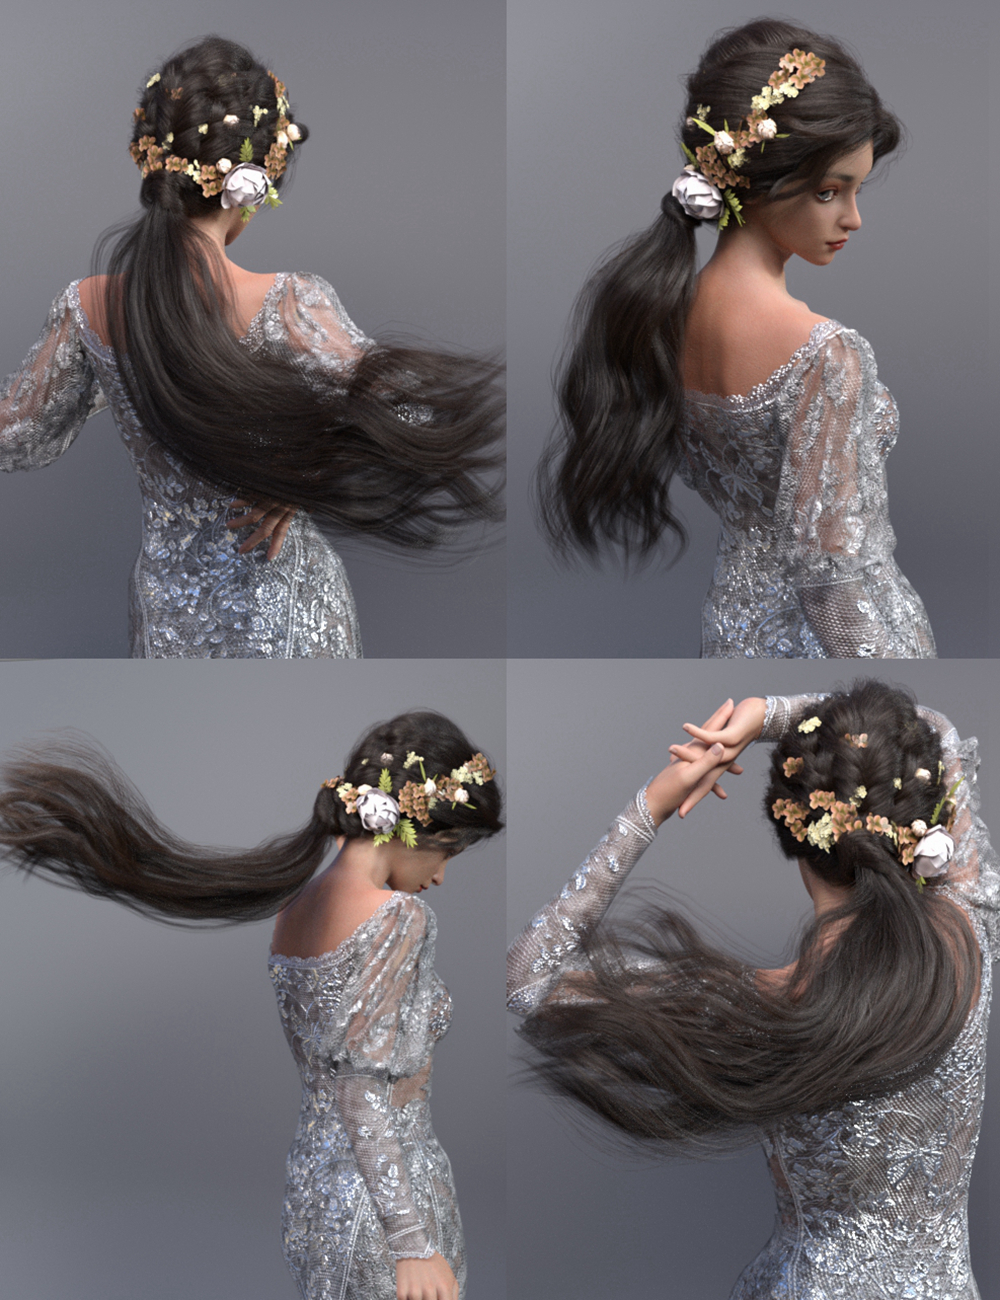 Kent Hair for Genesis 8.1 Female by: Ergou, 3D Models by Daz 3D